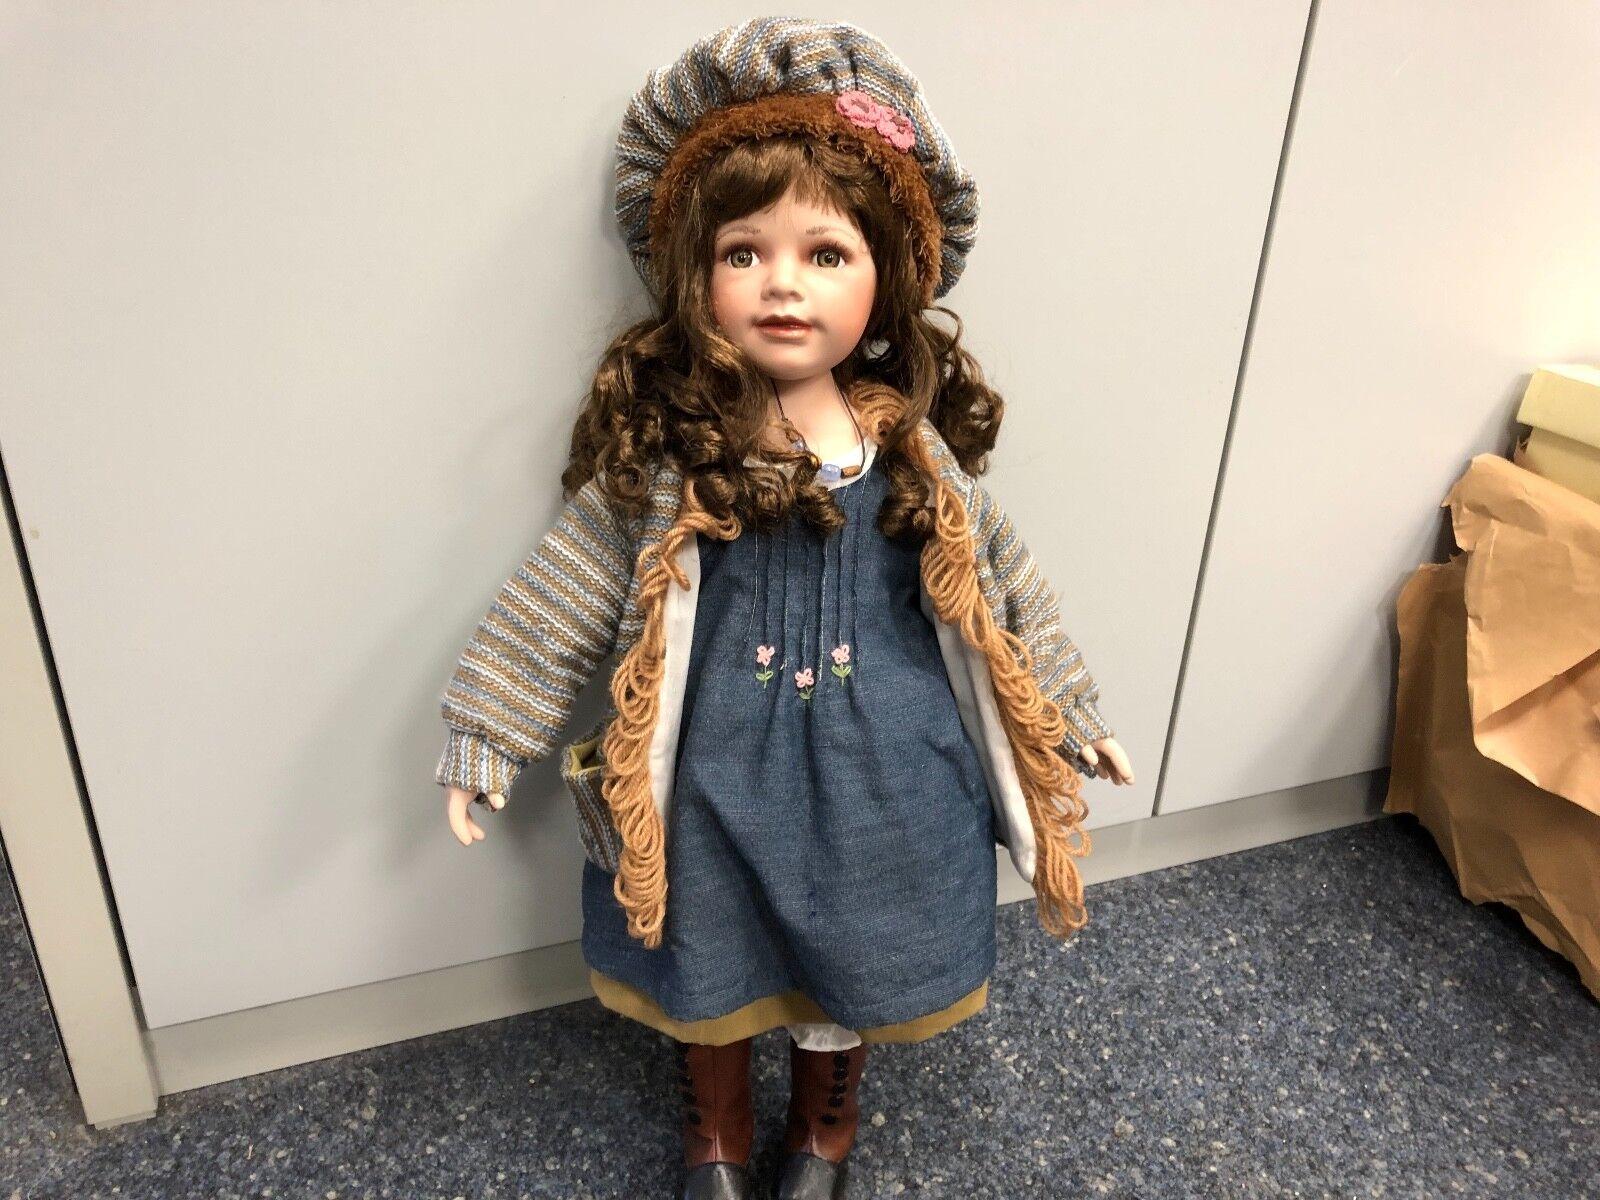 Künstlerpuppe Porzellan Puppe 66 cm. Top Zustand